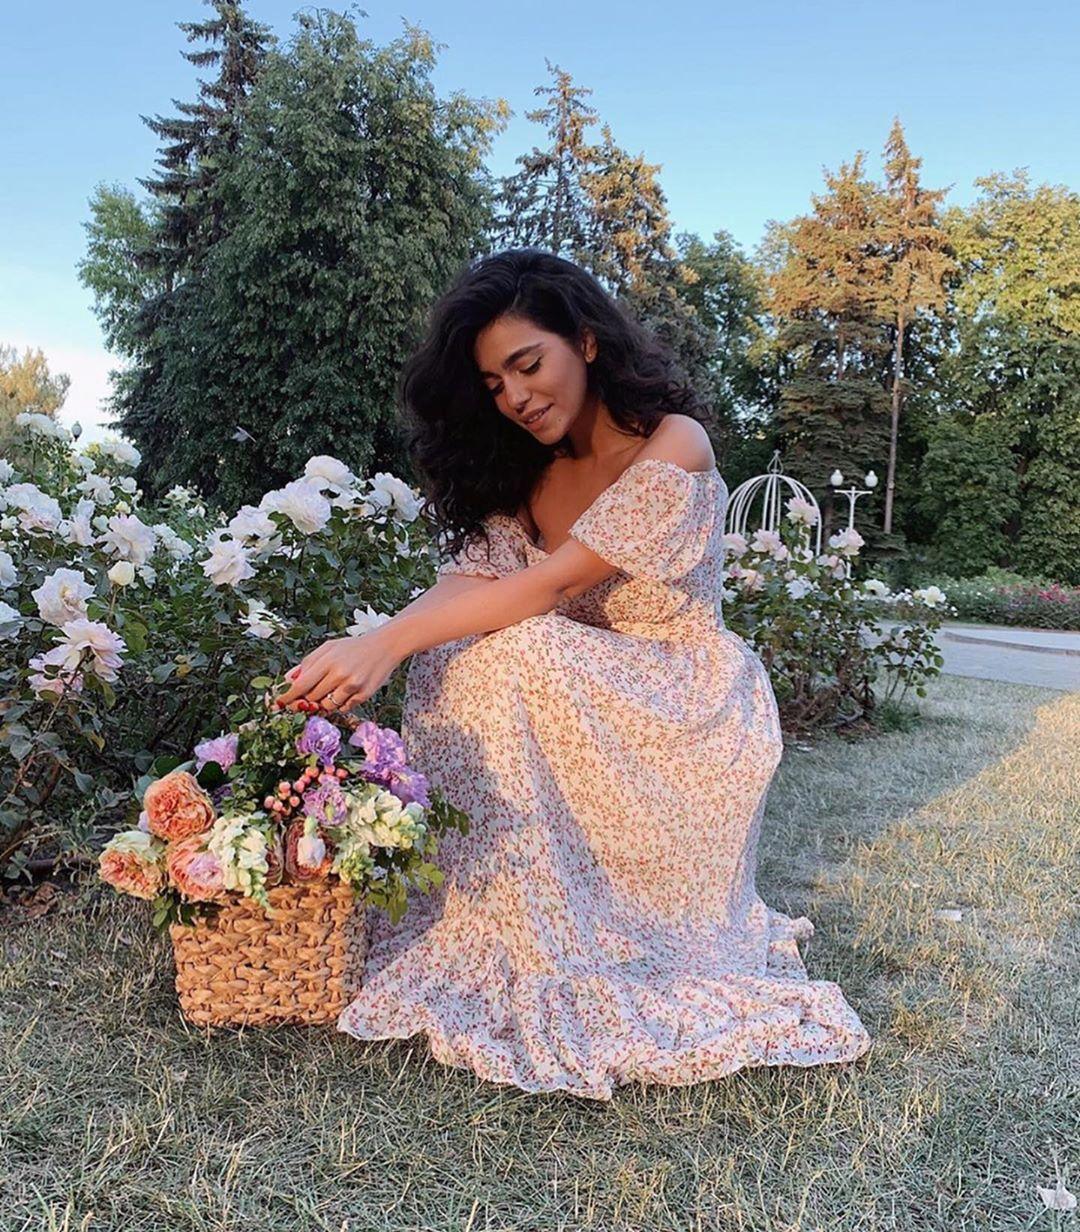 En Guzeli الأجمل On Instagram اكثر فستان عجبكم ياجمال الفساتين ونعومتها ونزلت للي طلبوني تنسيقات وفساتين Fashion Cute Outfits Outfits